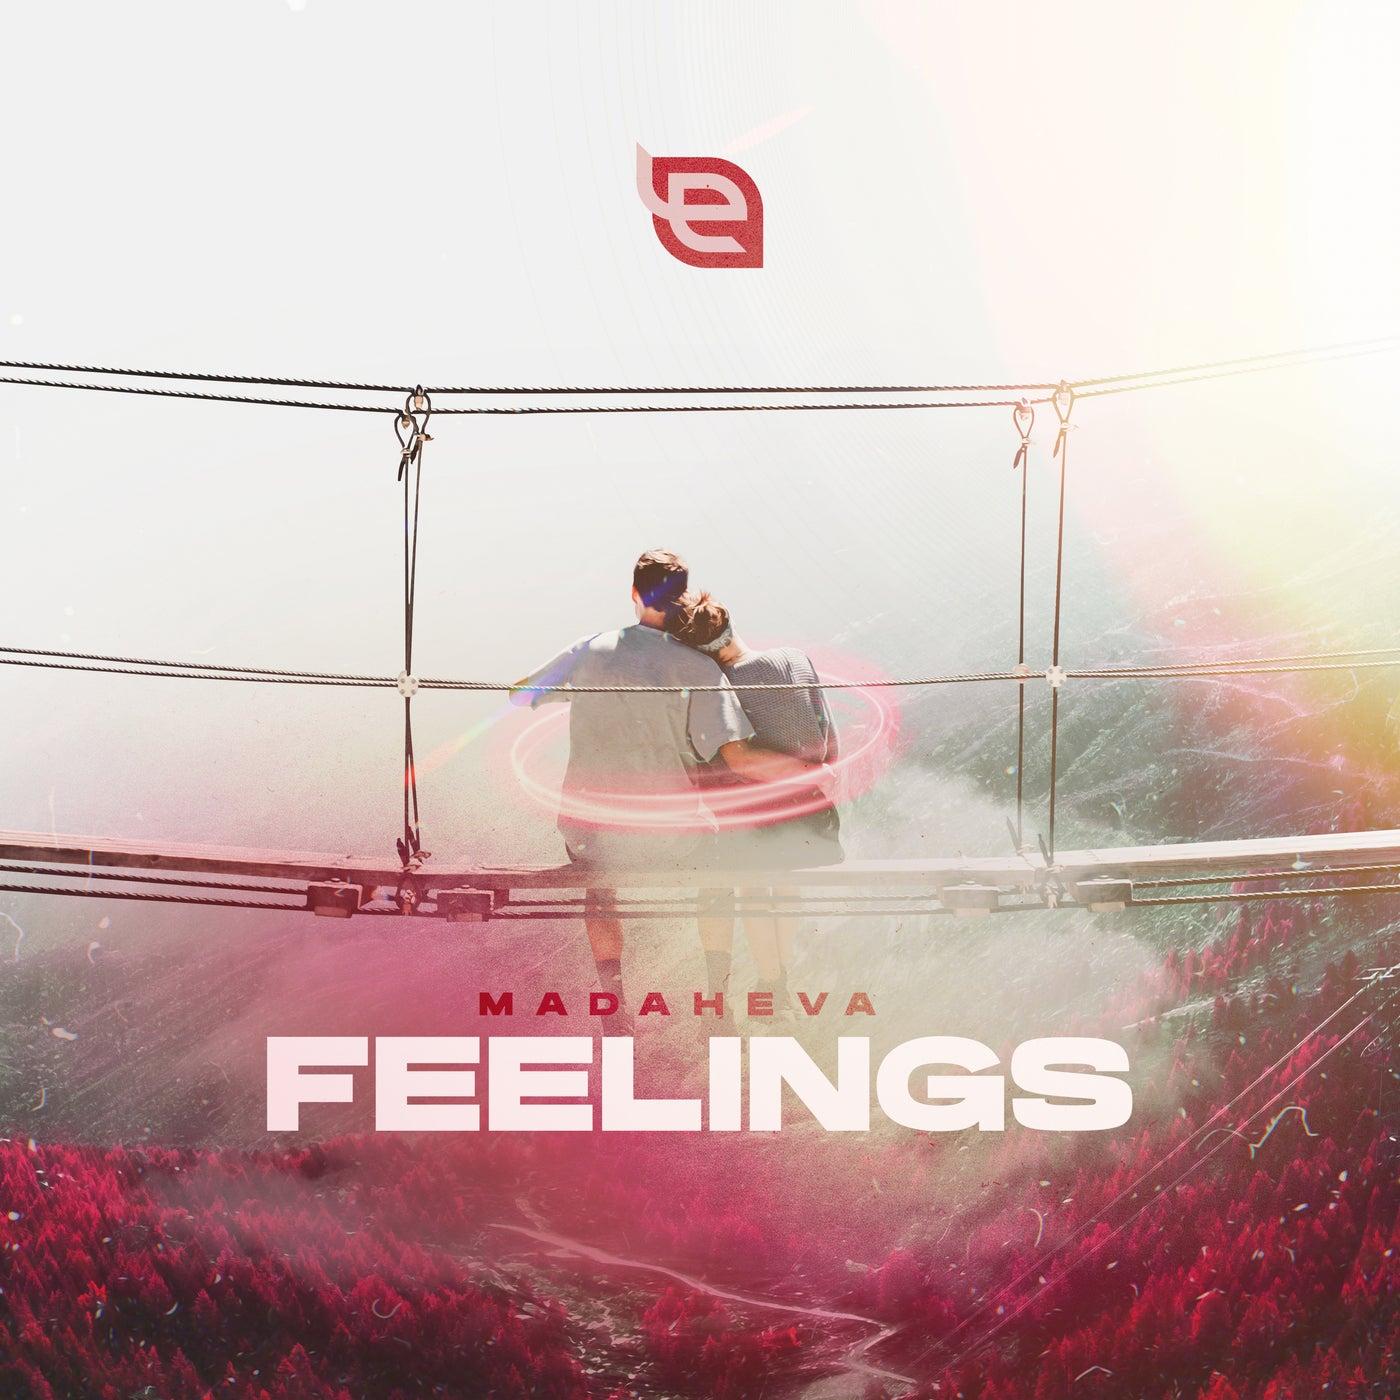 Feelings (Original Mix)